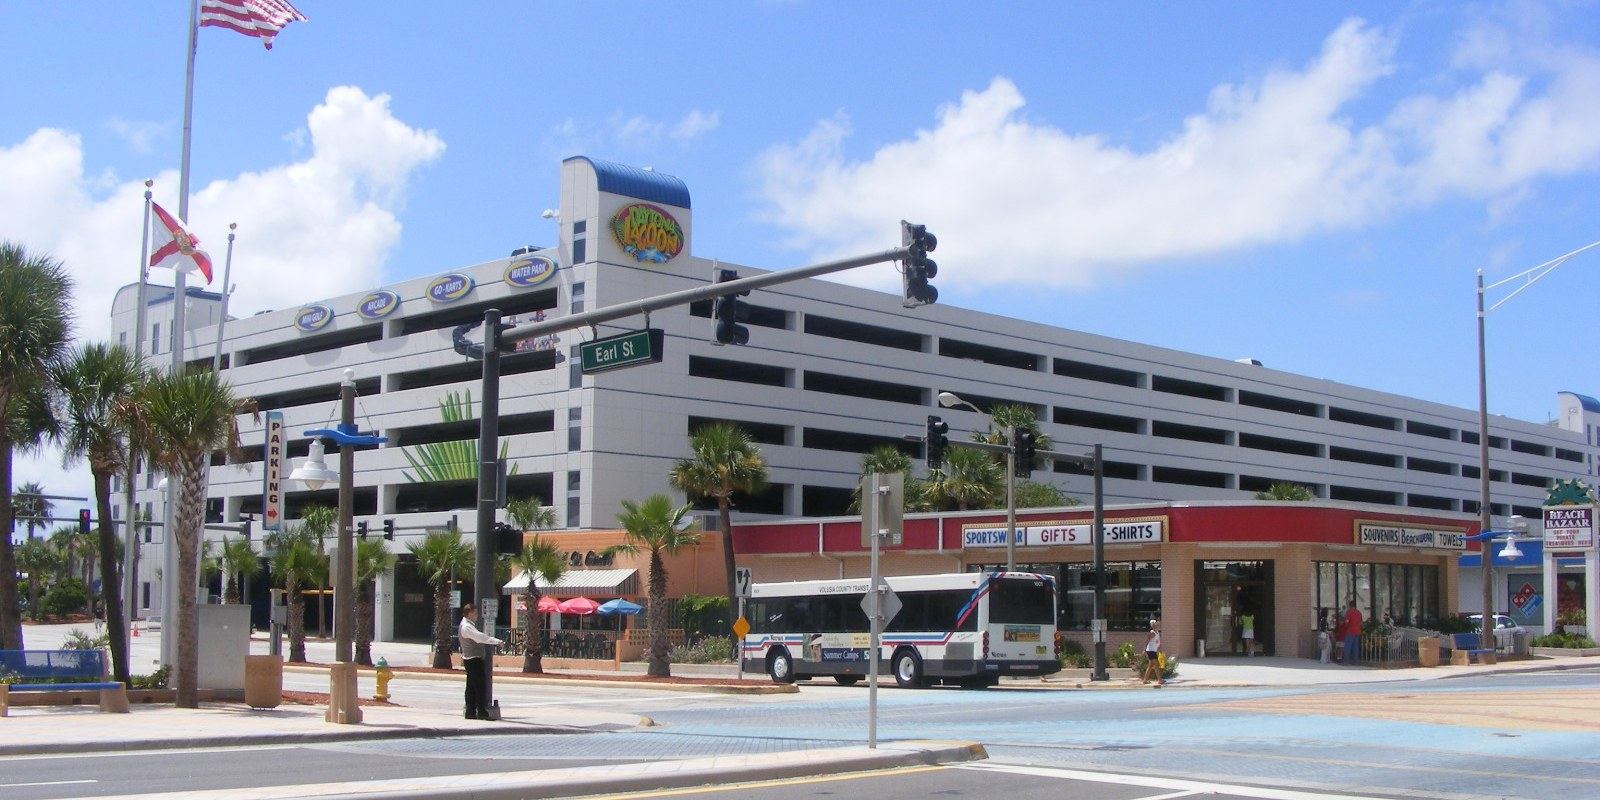 Daytona Beach Public Parking Garage